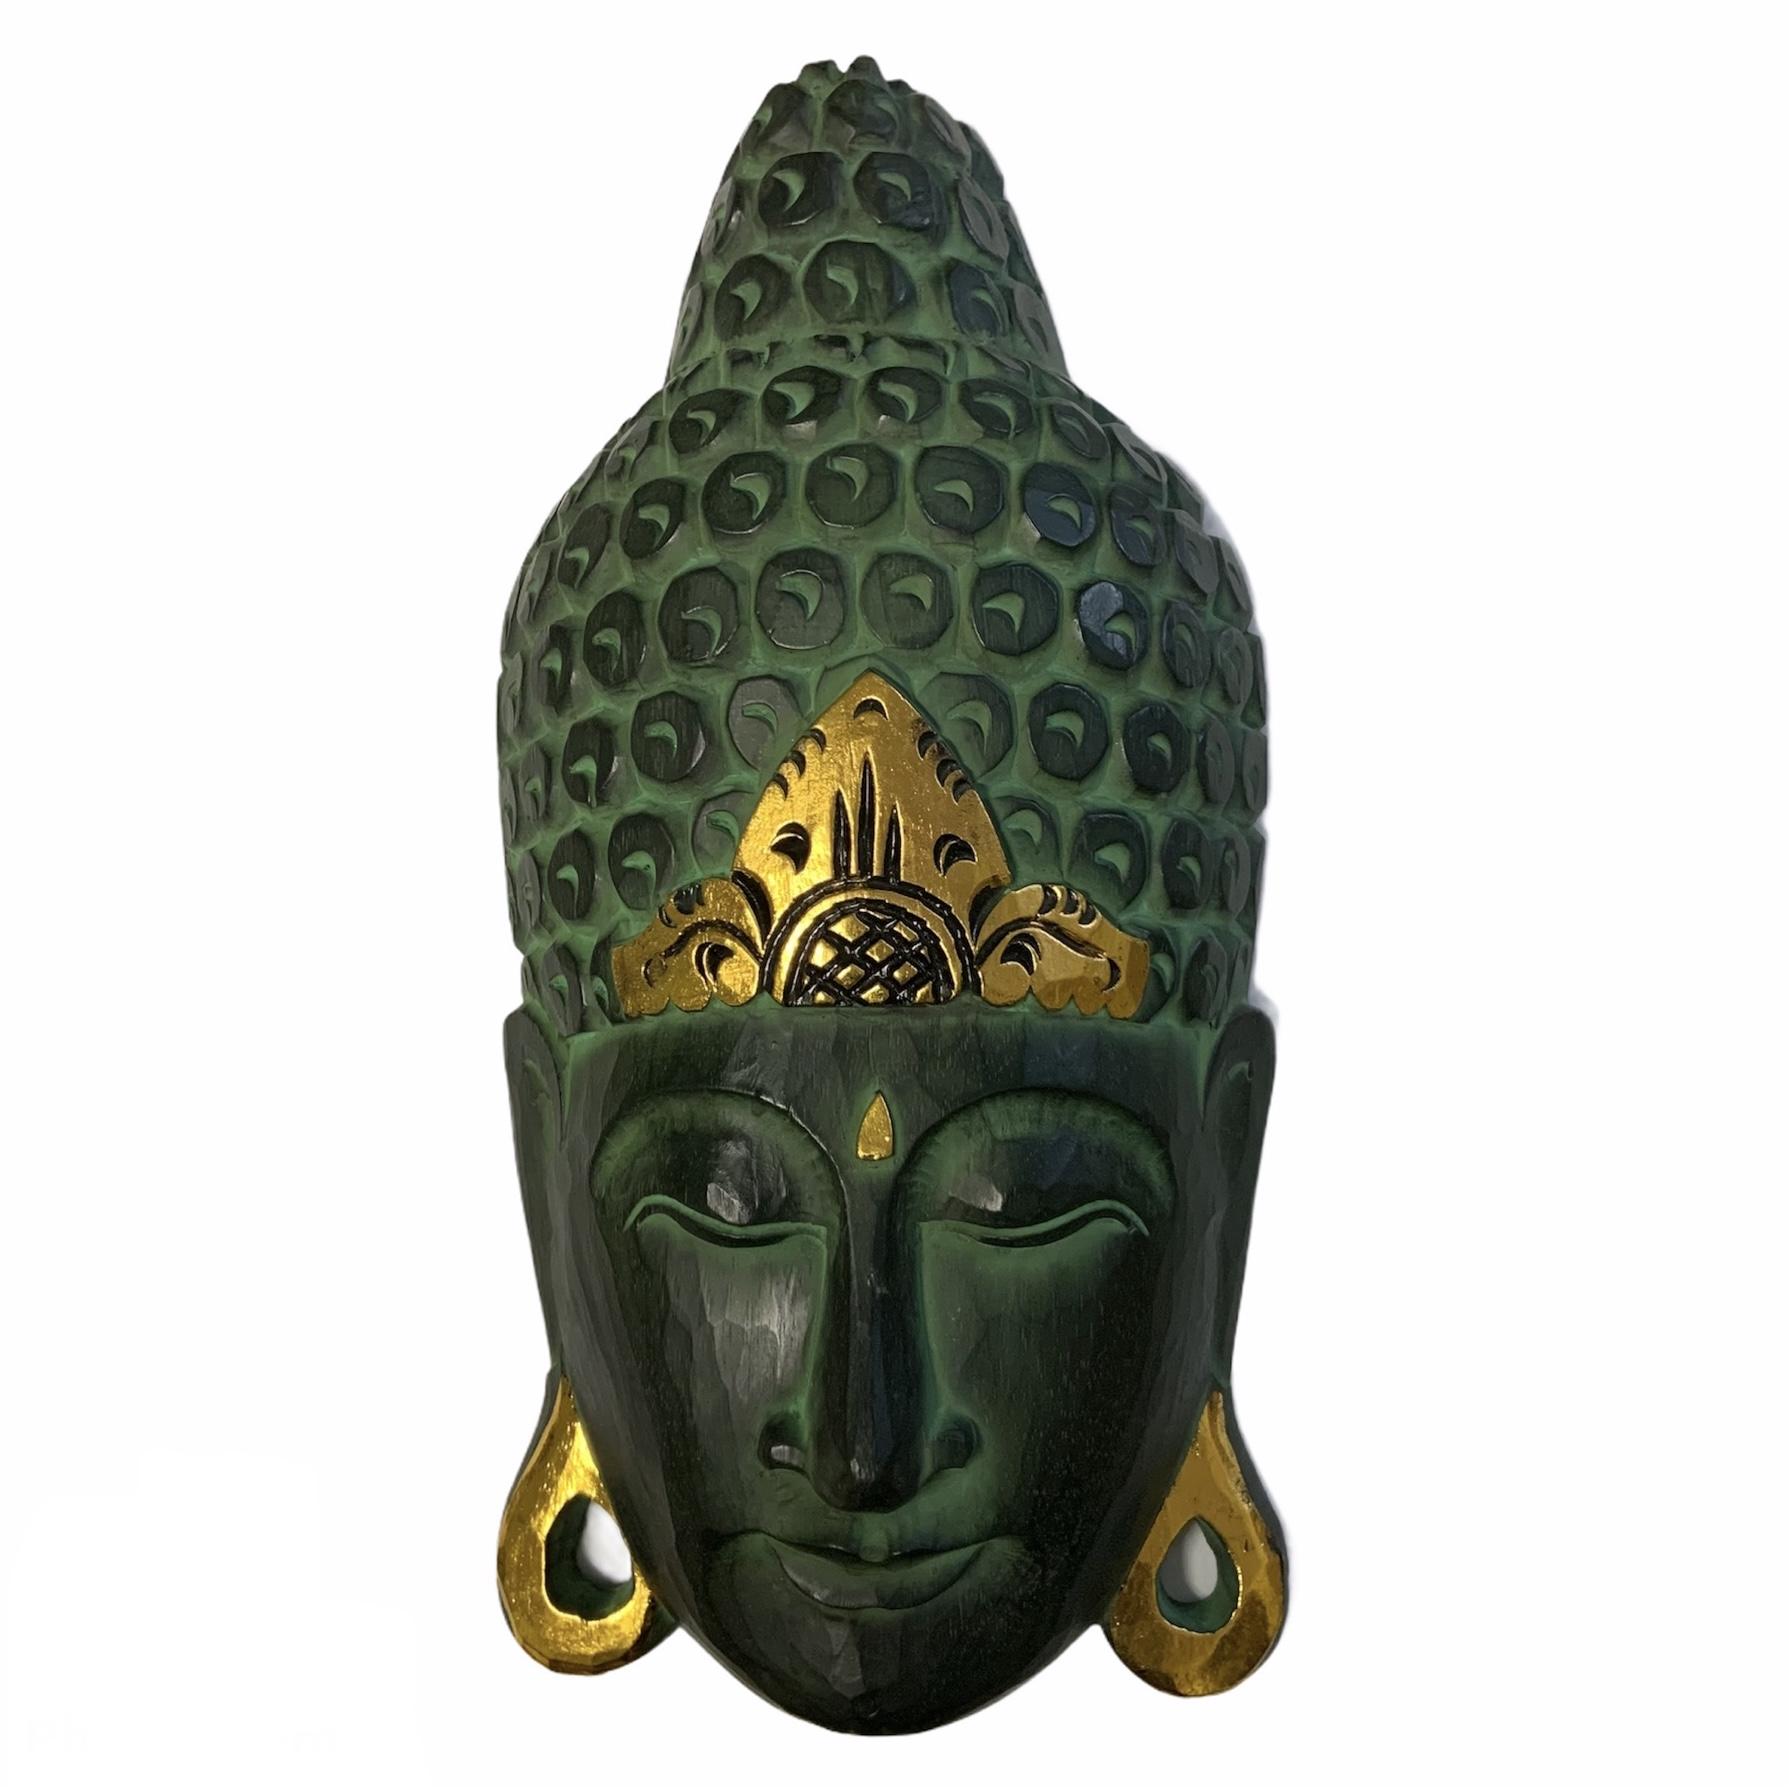 32298-mascara-buda-oro-verde-53-cm.jpeg